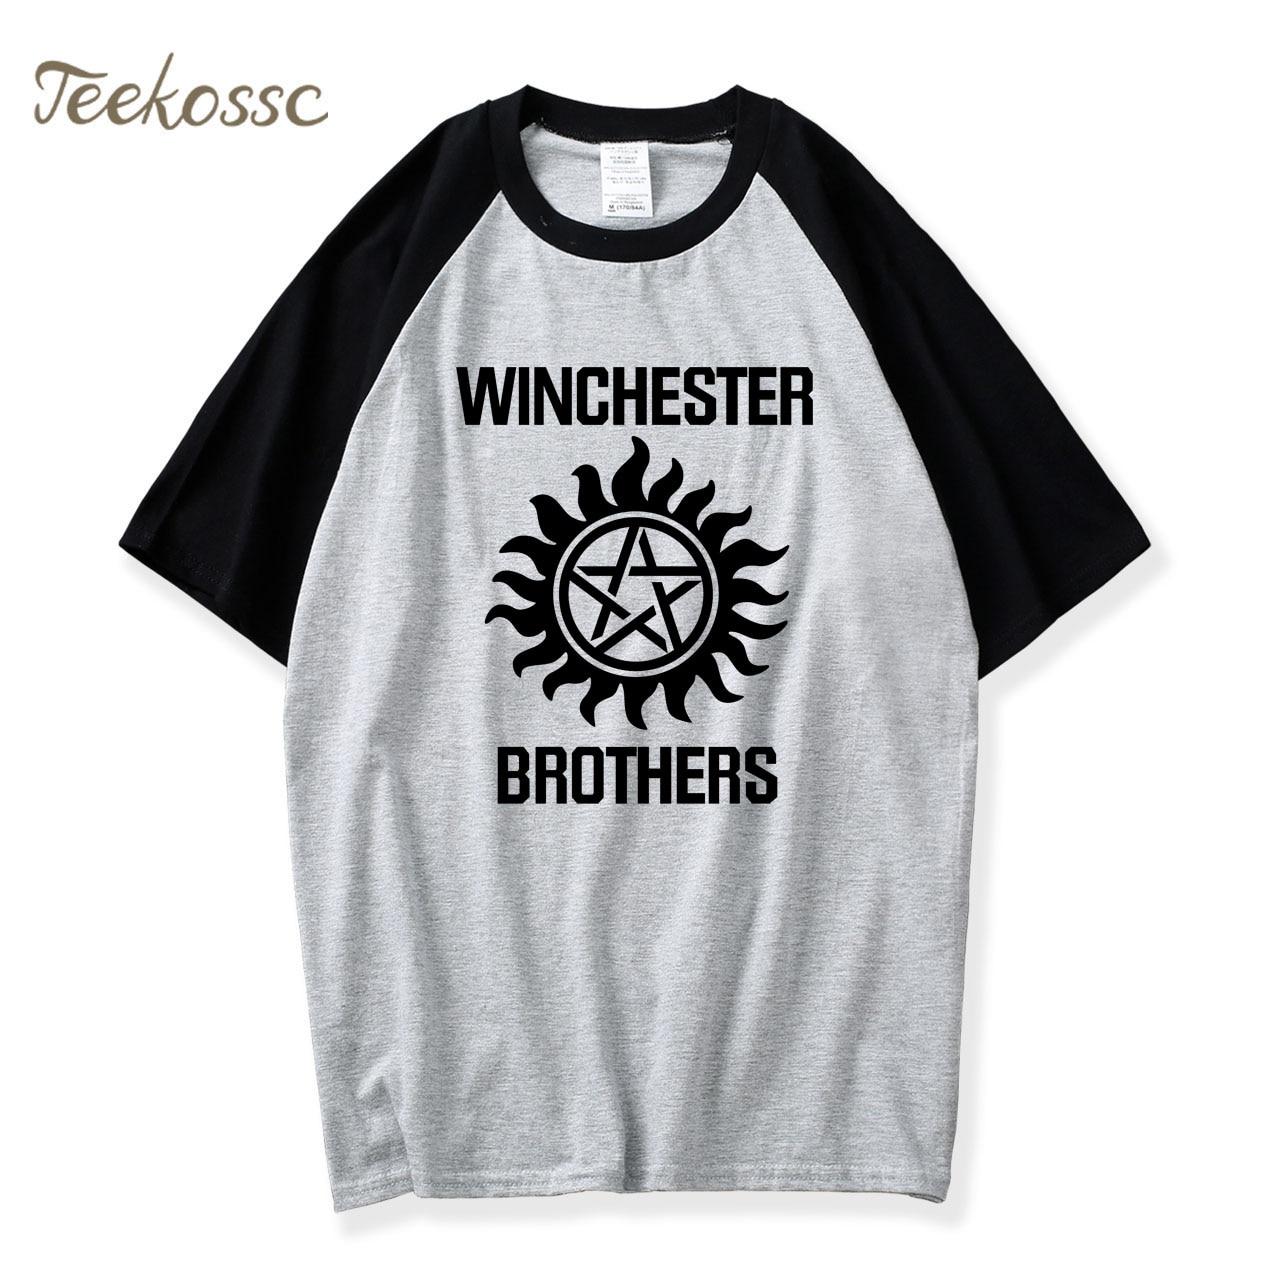 Supernatural T Shrit Winchester Brother Tshirt 2018 Hot Sale Summer Raglan T Shirt Men 100% Cotton Casual T-Shirt Camiseta Tees